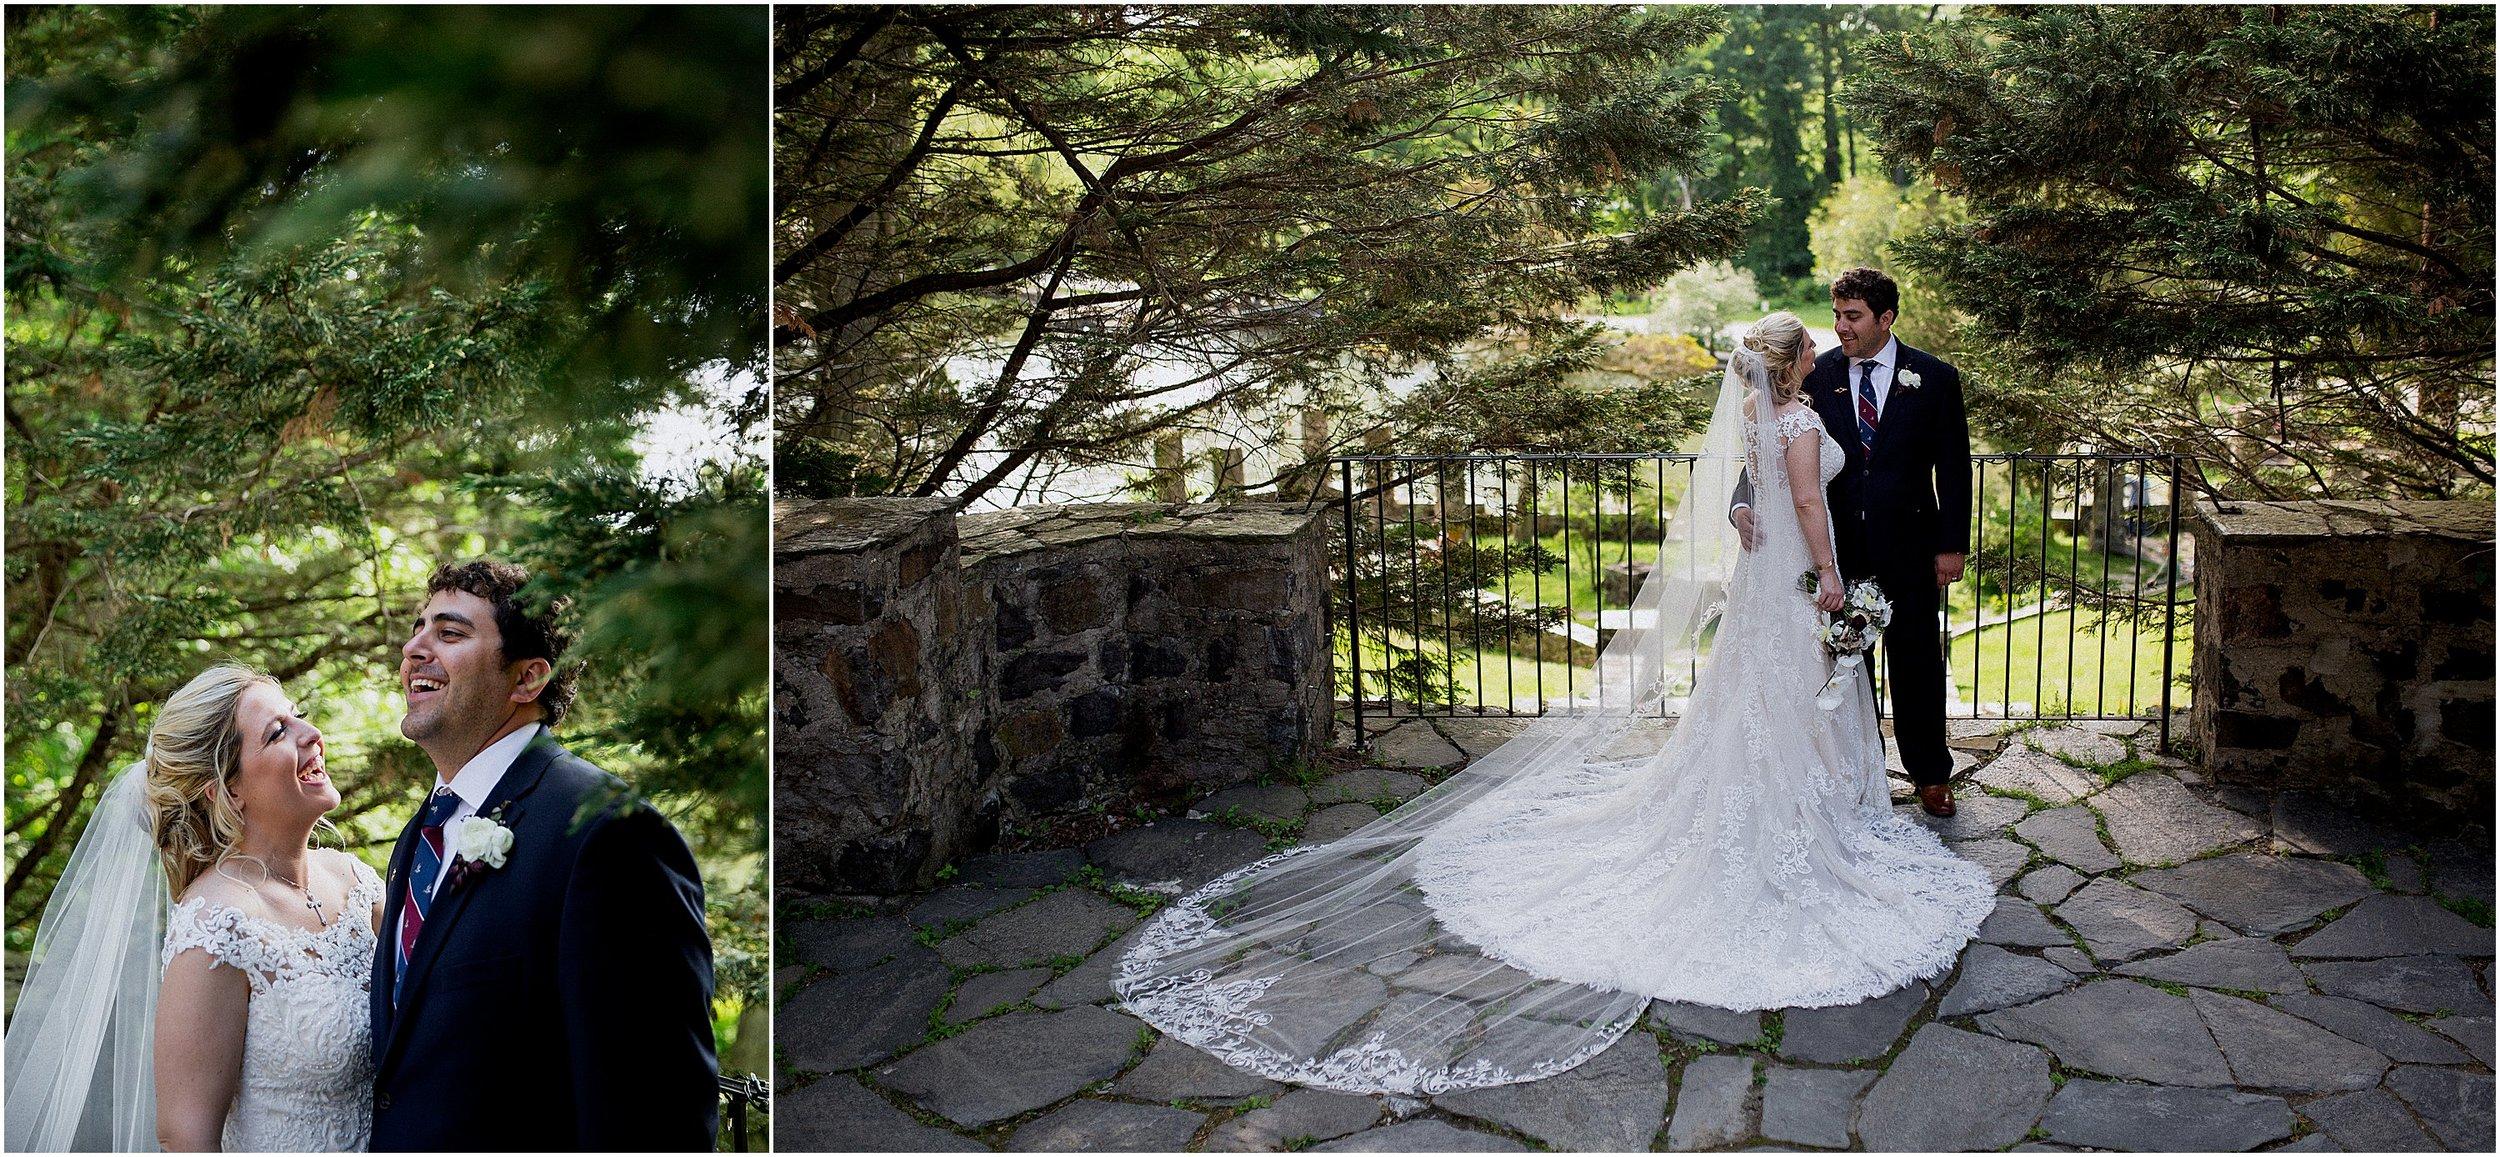 Philly_Wedding_Photographer_0033.jpg